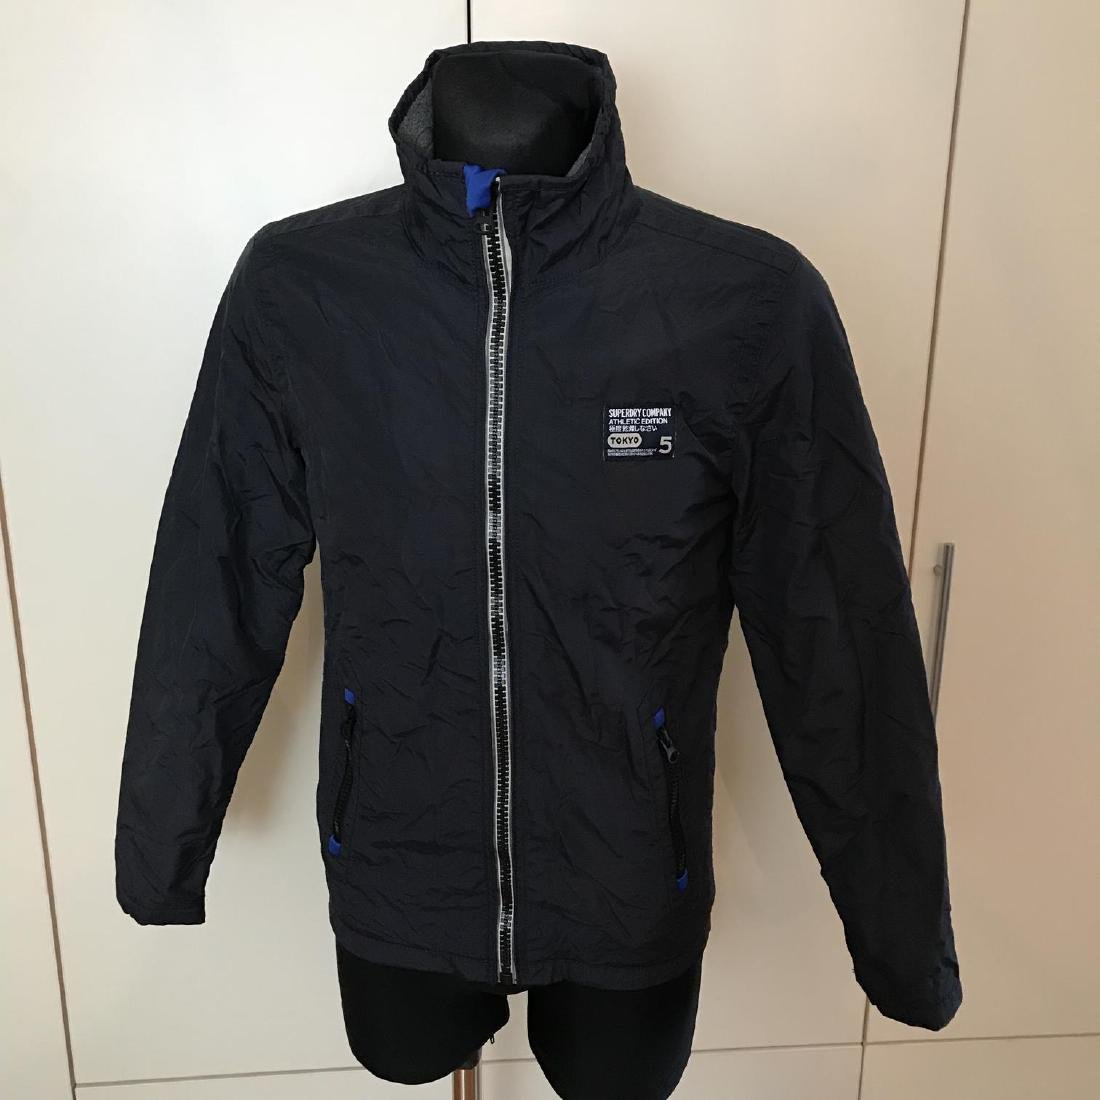 Men's Superdry TOKYO 5 Navy Blue Jacket Size S Perfect!